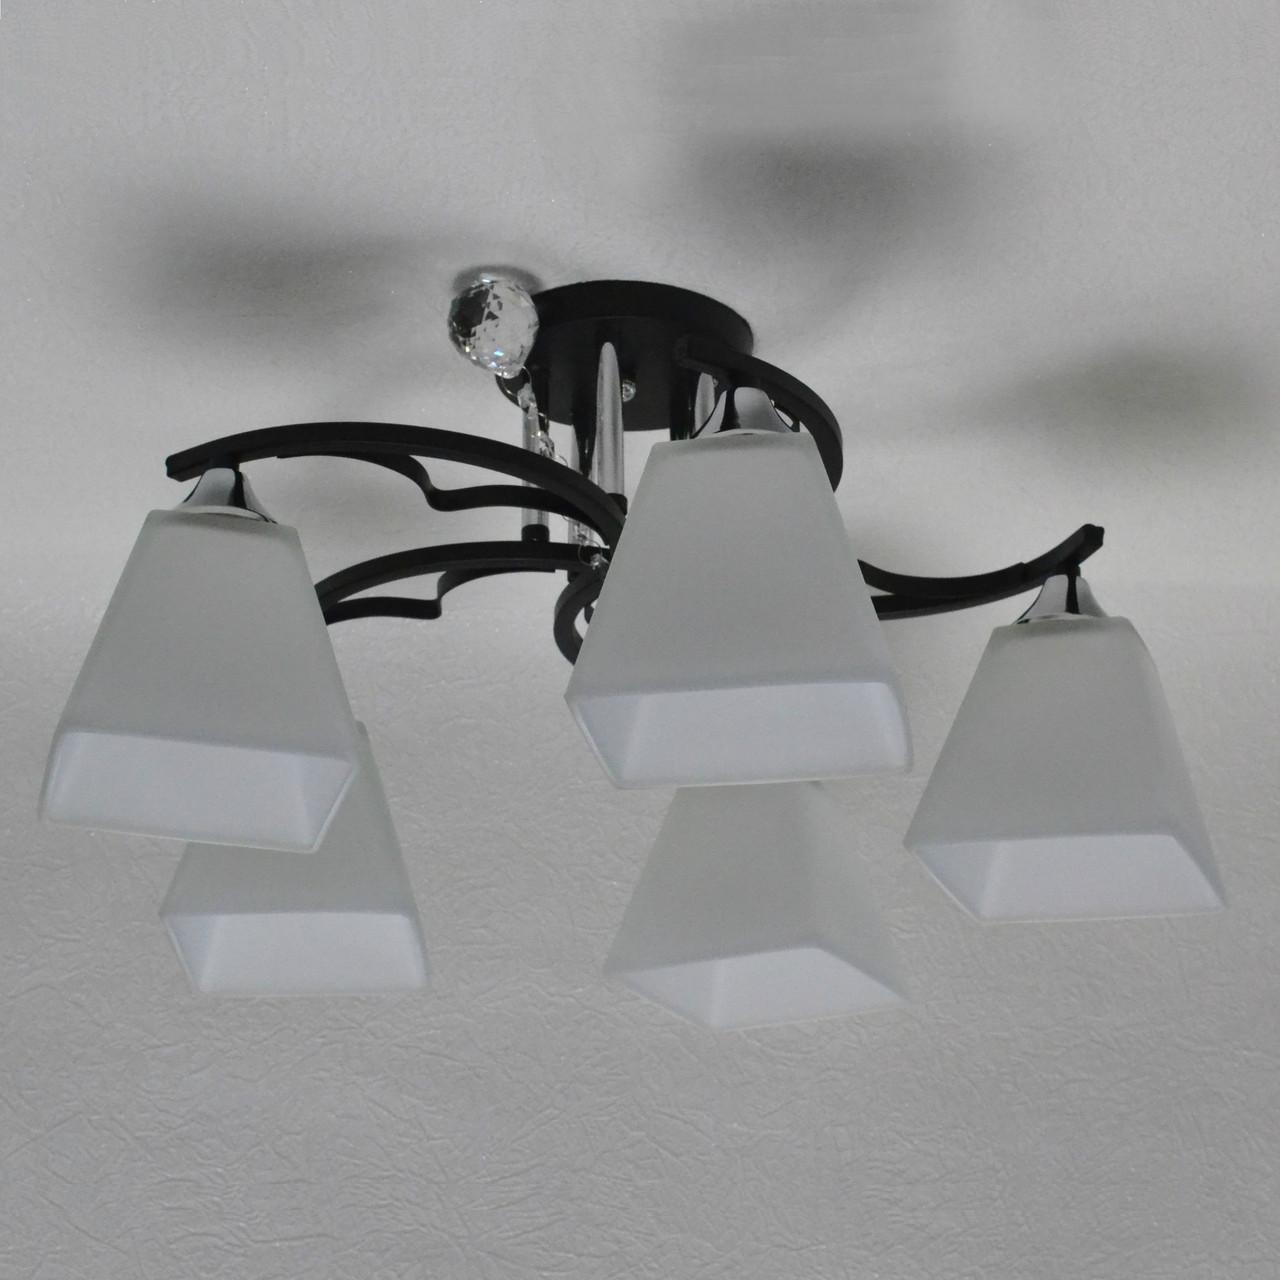 Люстра на 5 ламп чорна основа білі плафони